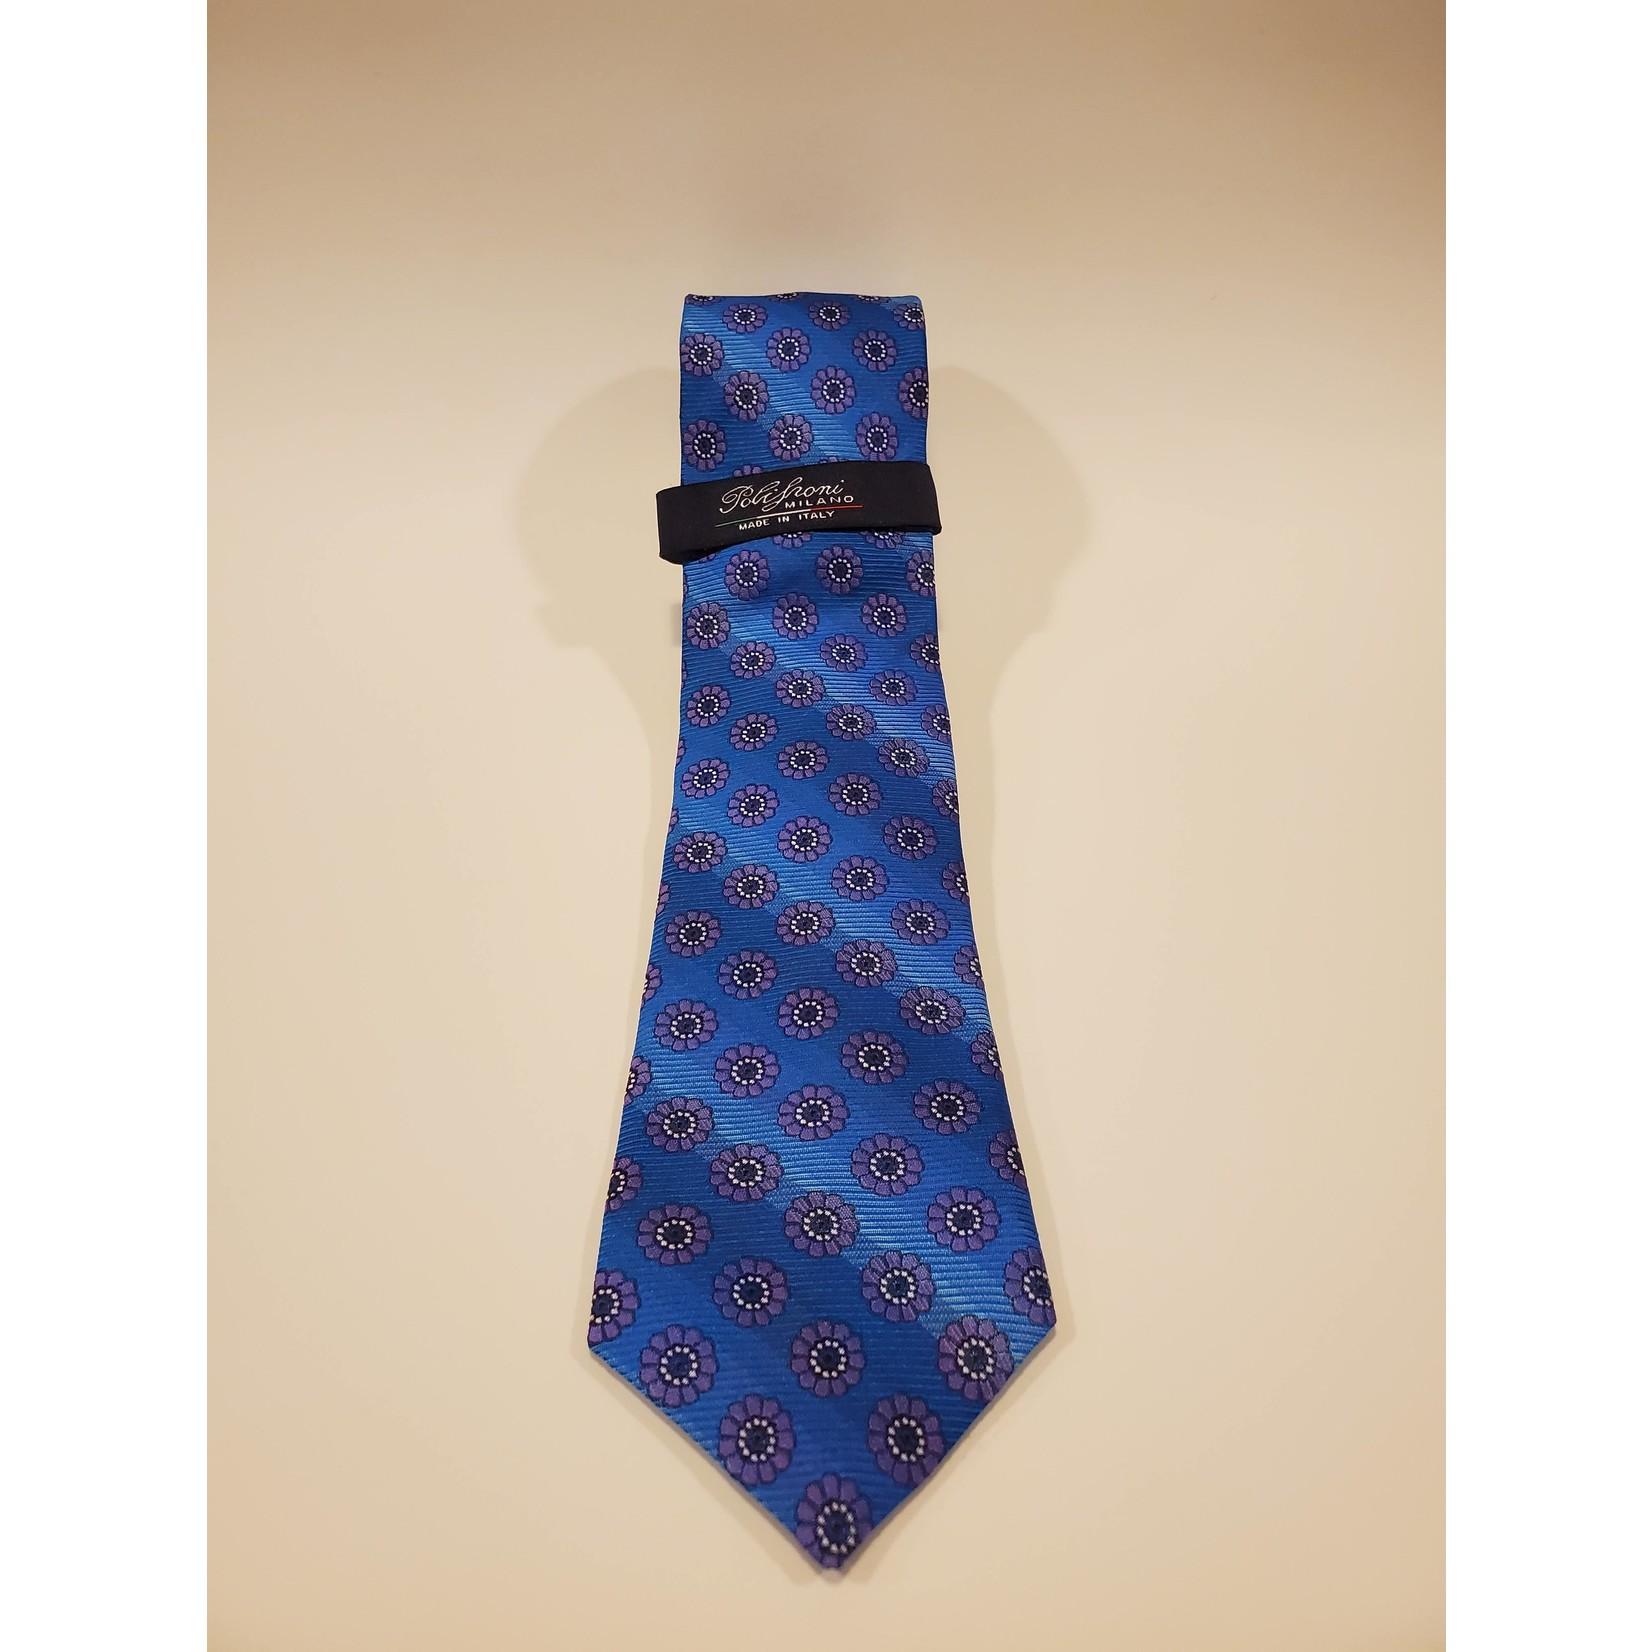 Polifroni Polifroni 211904 Jacquard Floral Silk Tie